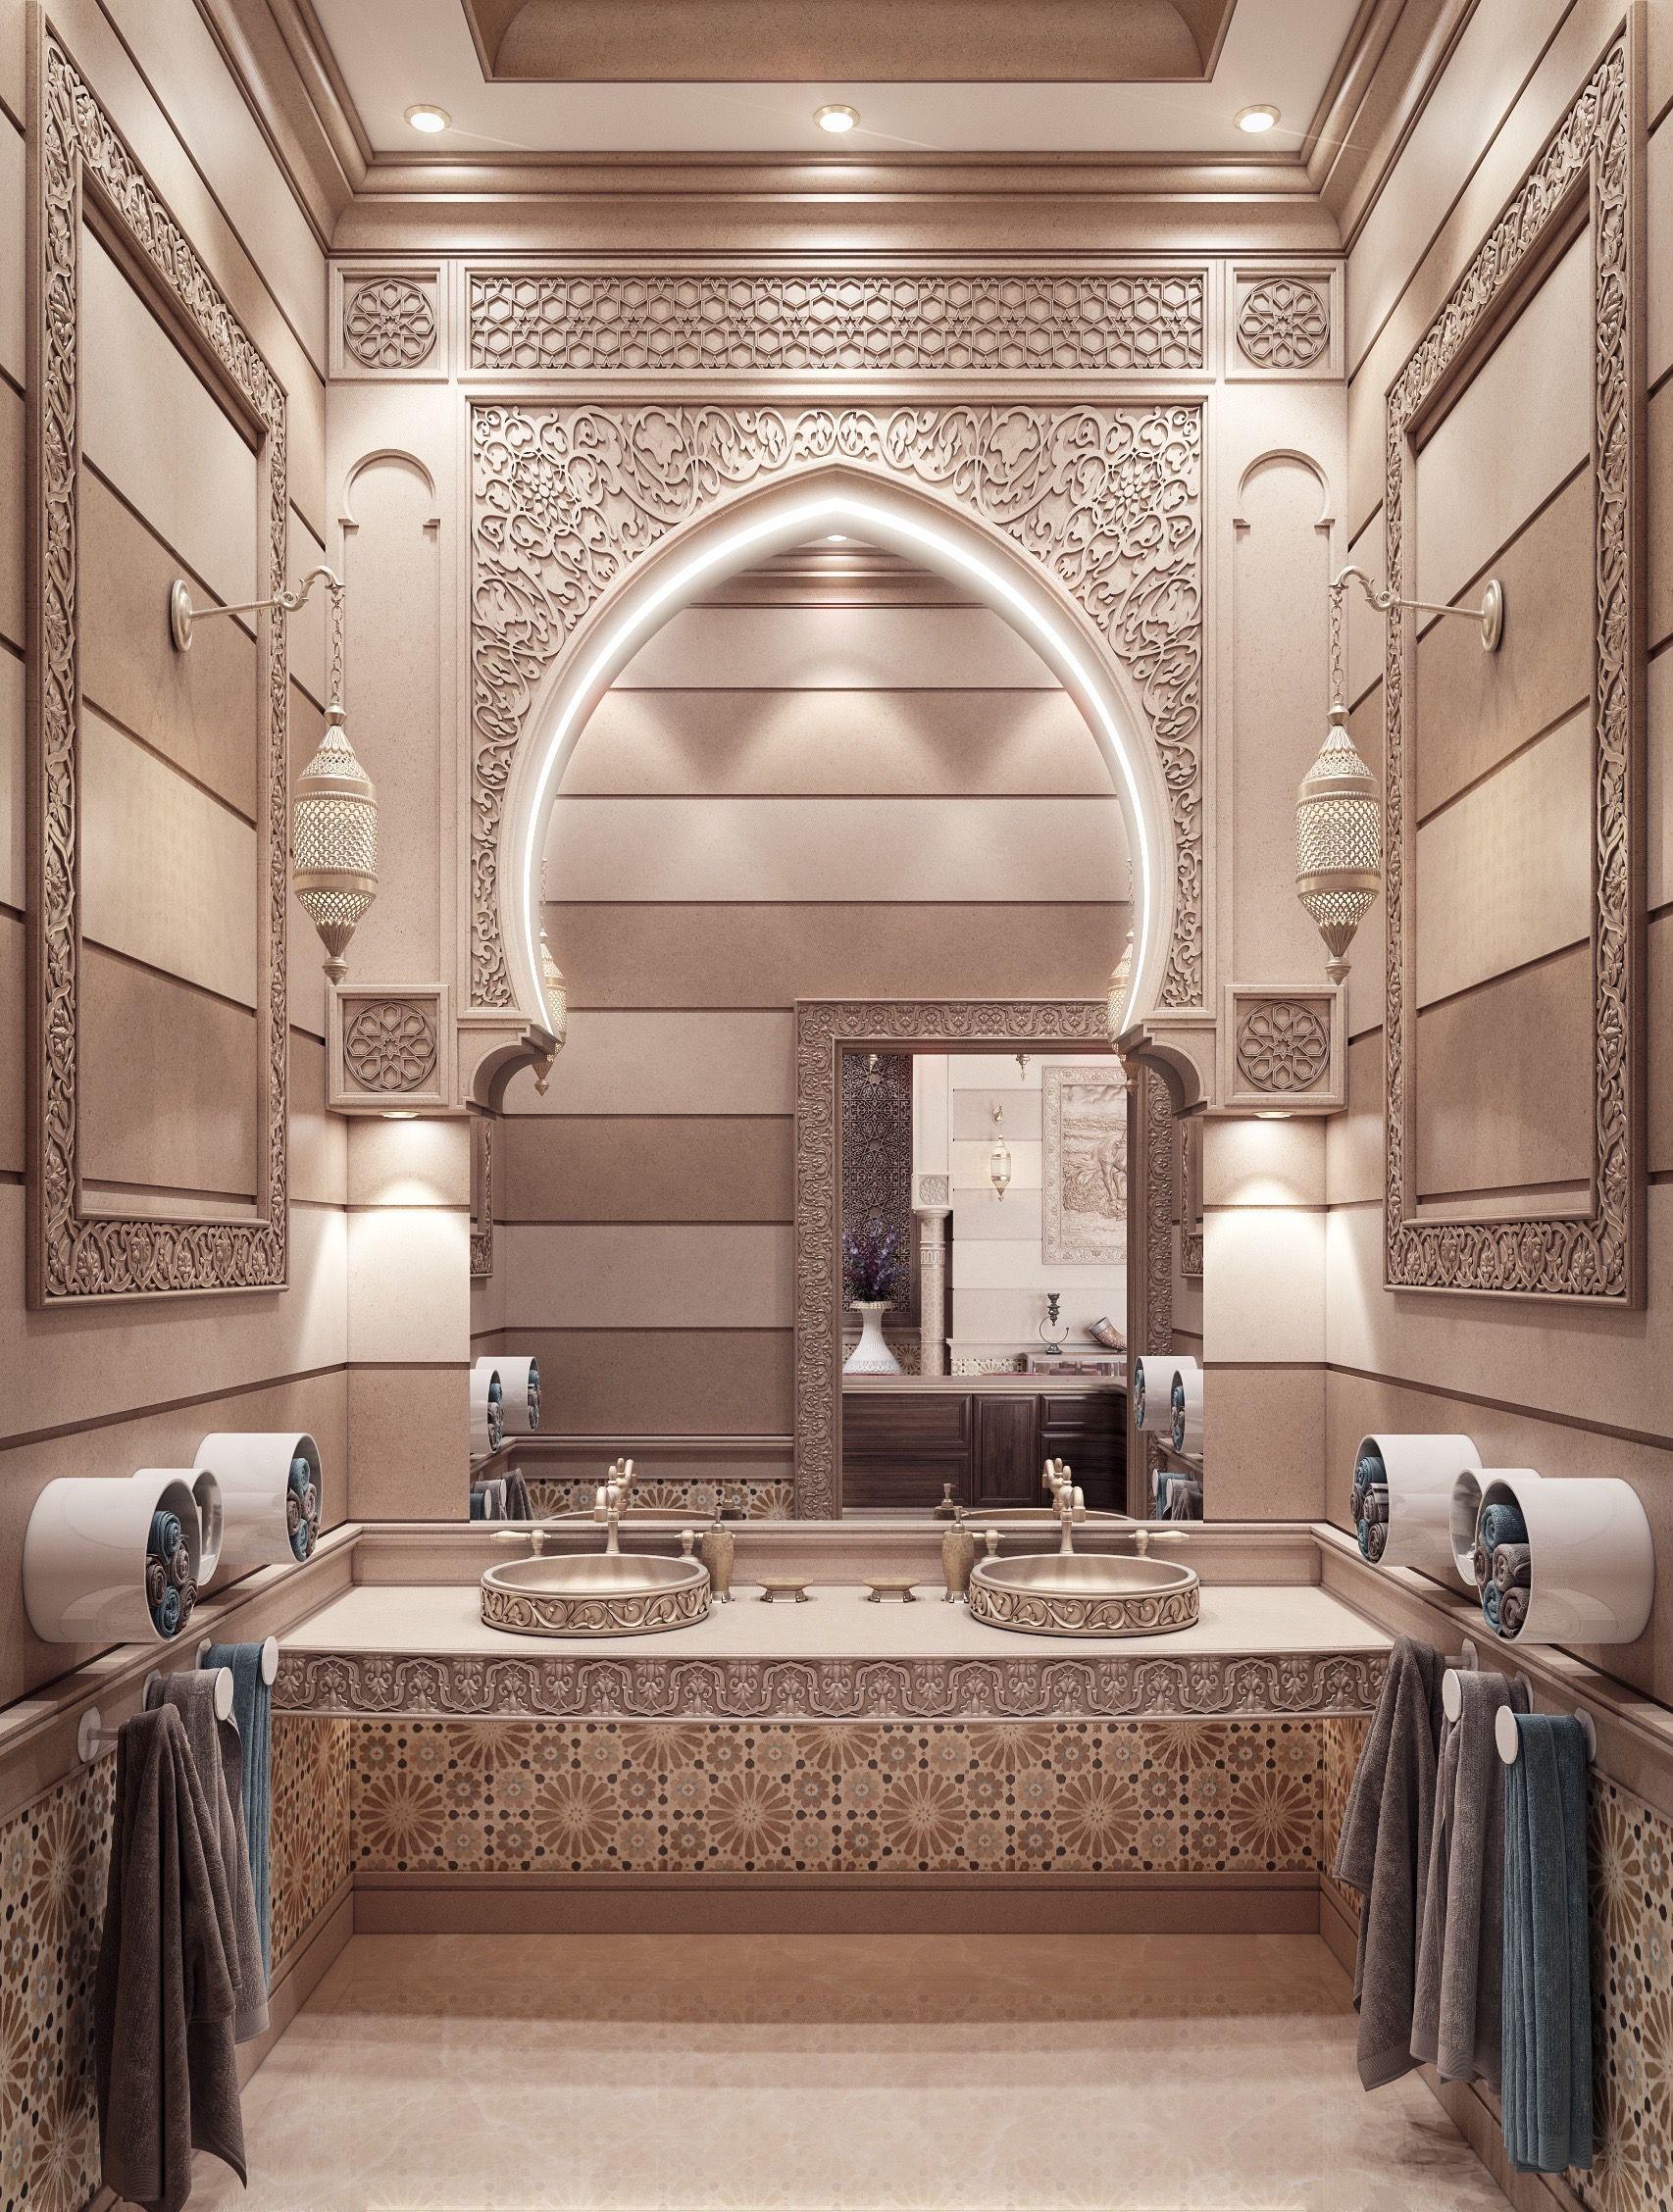 Pin by Mabrouk on البيت العربي Arab house in 2018 | Pinterest ...